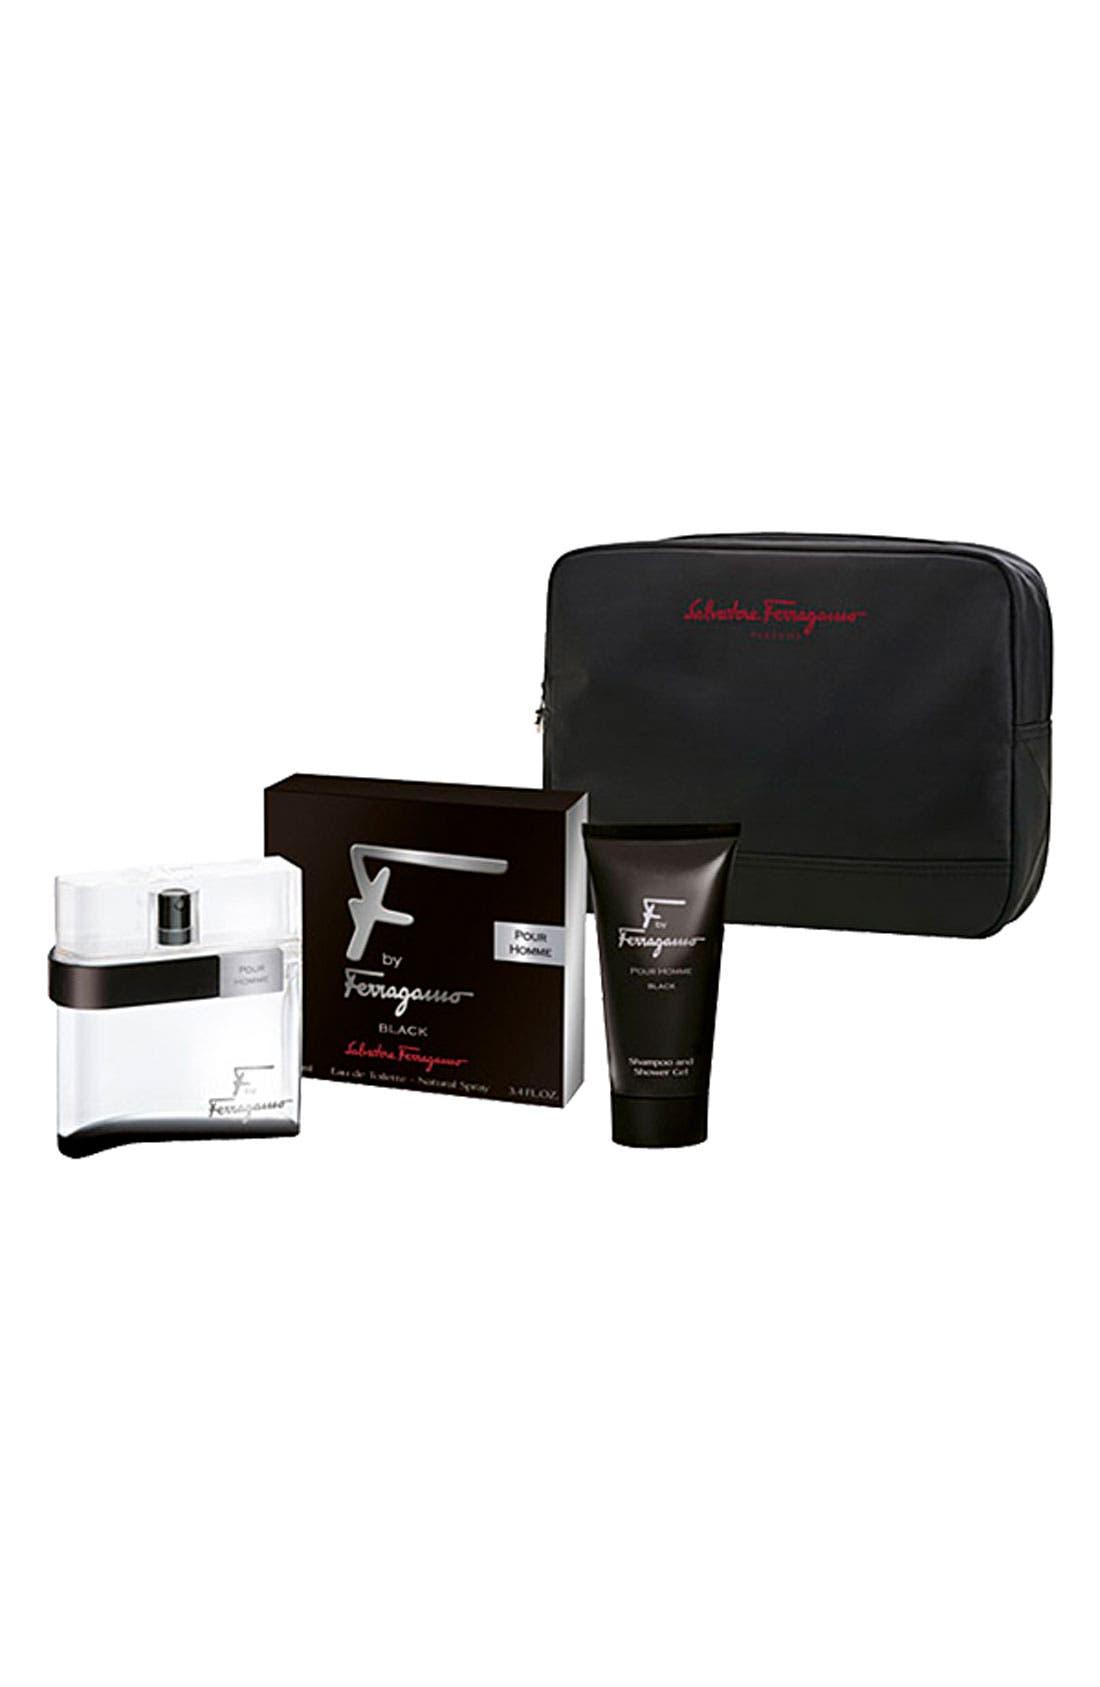 Alternate Image 1 Selected - Salvatore Ferragamo 'F by Ferragamo pour Homme Black' Set ($95 Value)